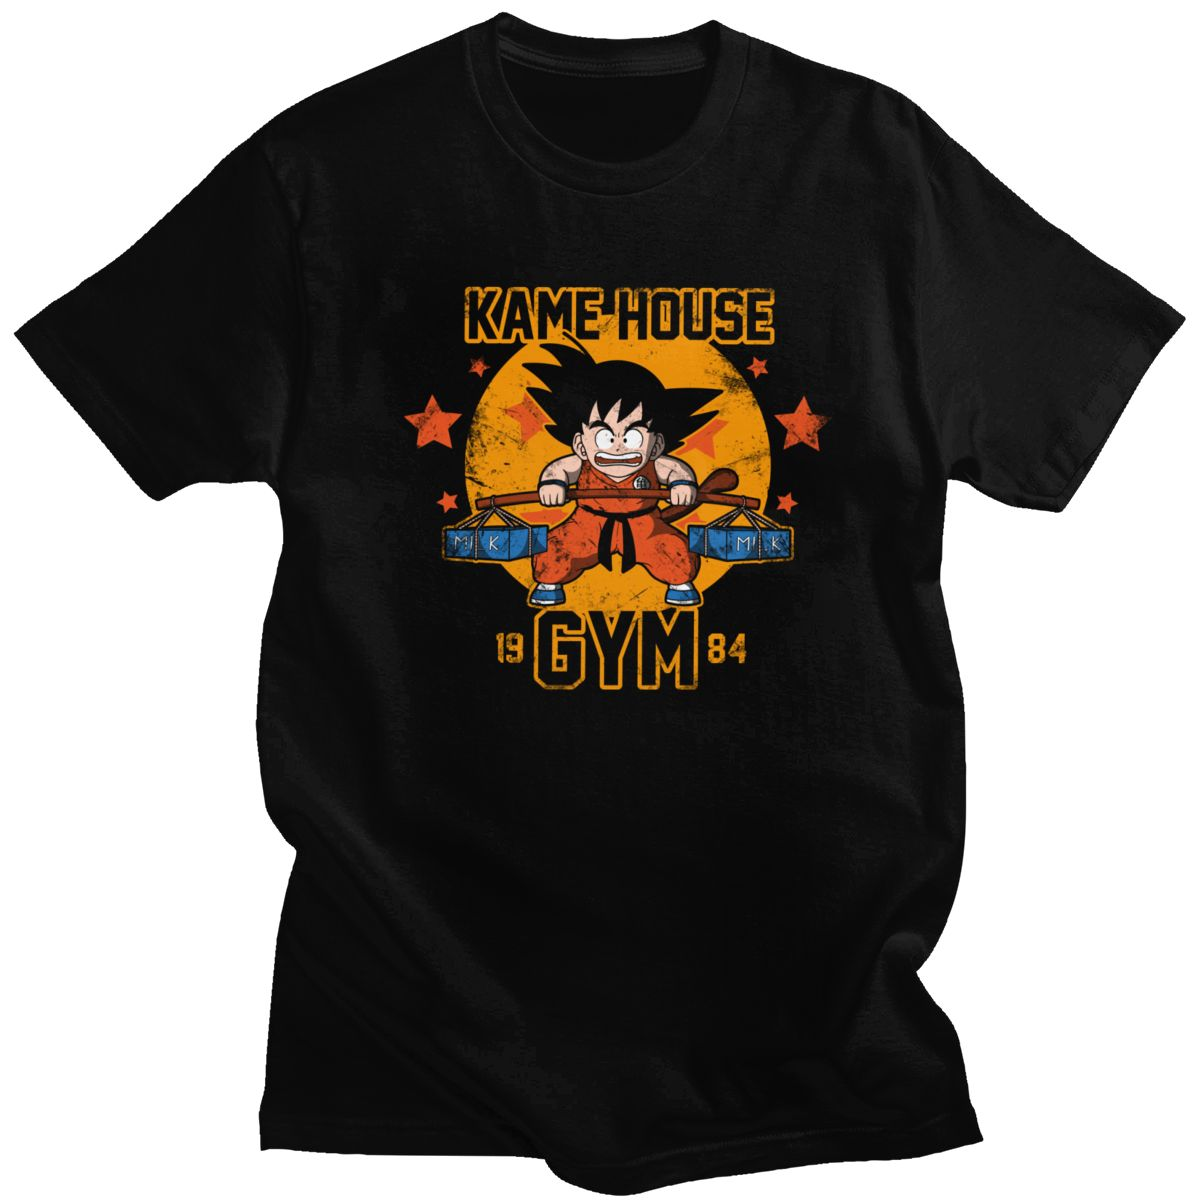 Grappig Dragon Ball Z Super Zoon Goku T-shirt Mannen Korte Mouwen Saiyan Gym Tshirt Vintage Japan Anime T-shirt Katoen tee Tops Gift